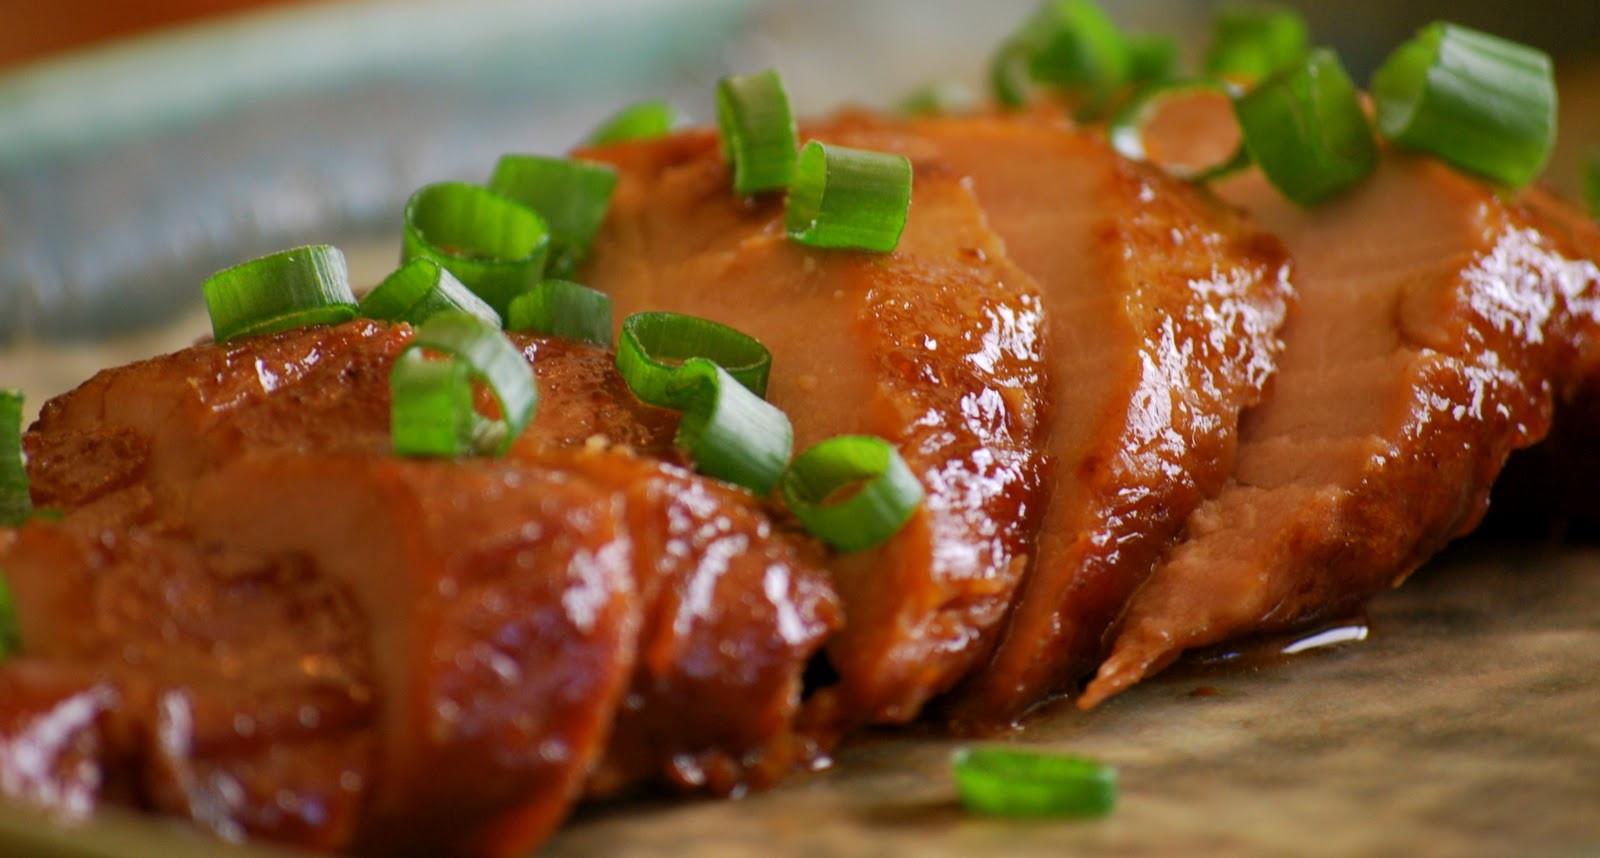 Easy Sauces For Pork Tenderloin  Pork Tenderloin with Hoisin Sauce Amanda Jane Brown